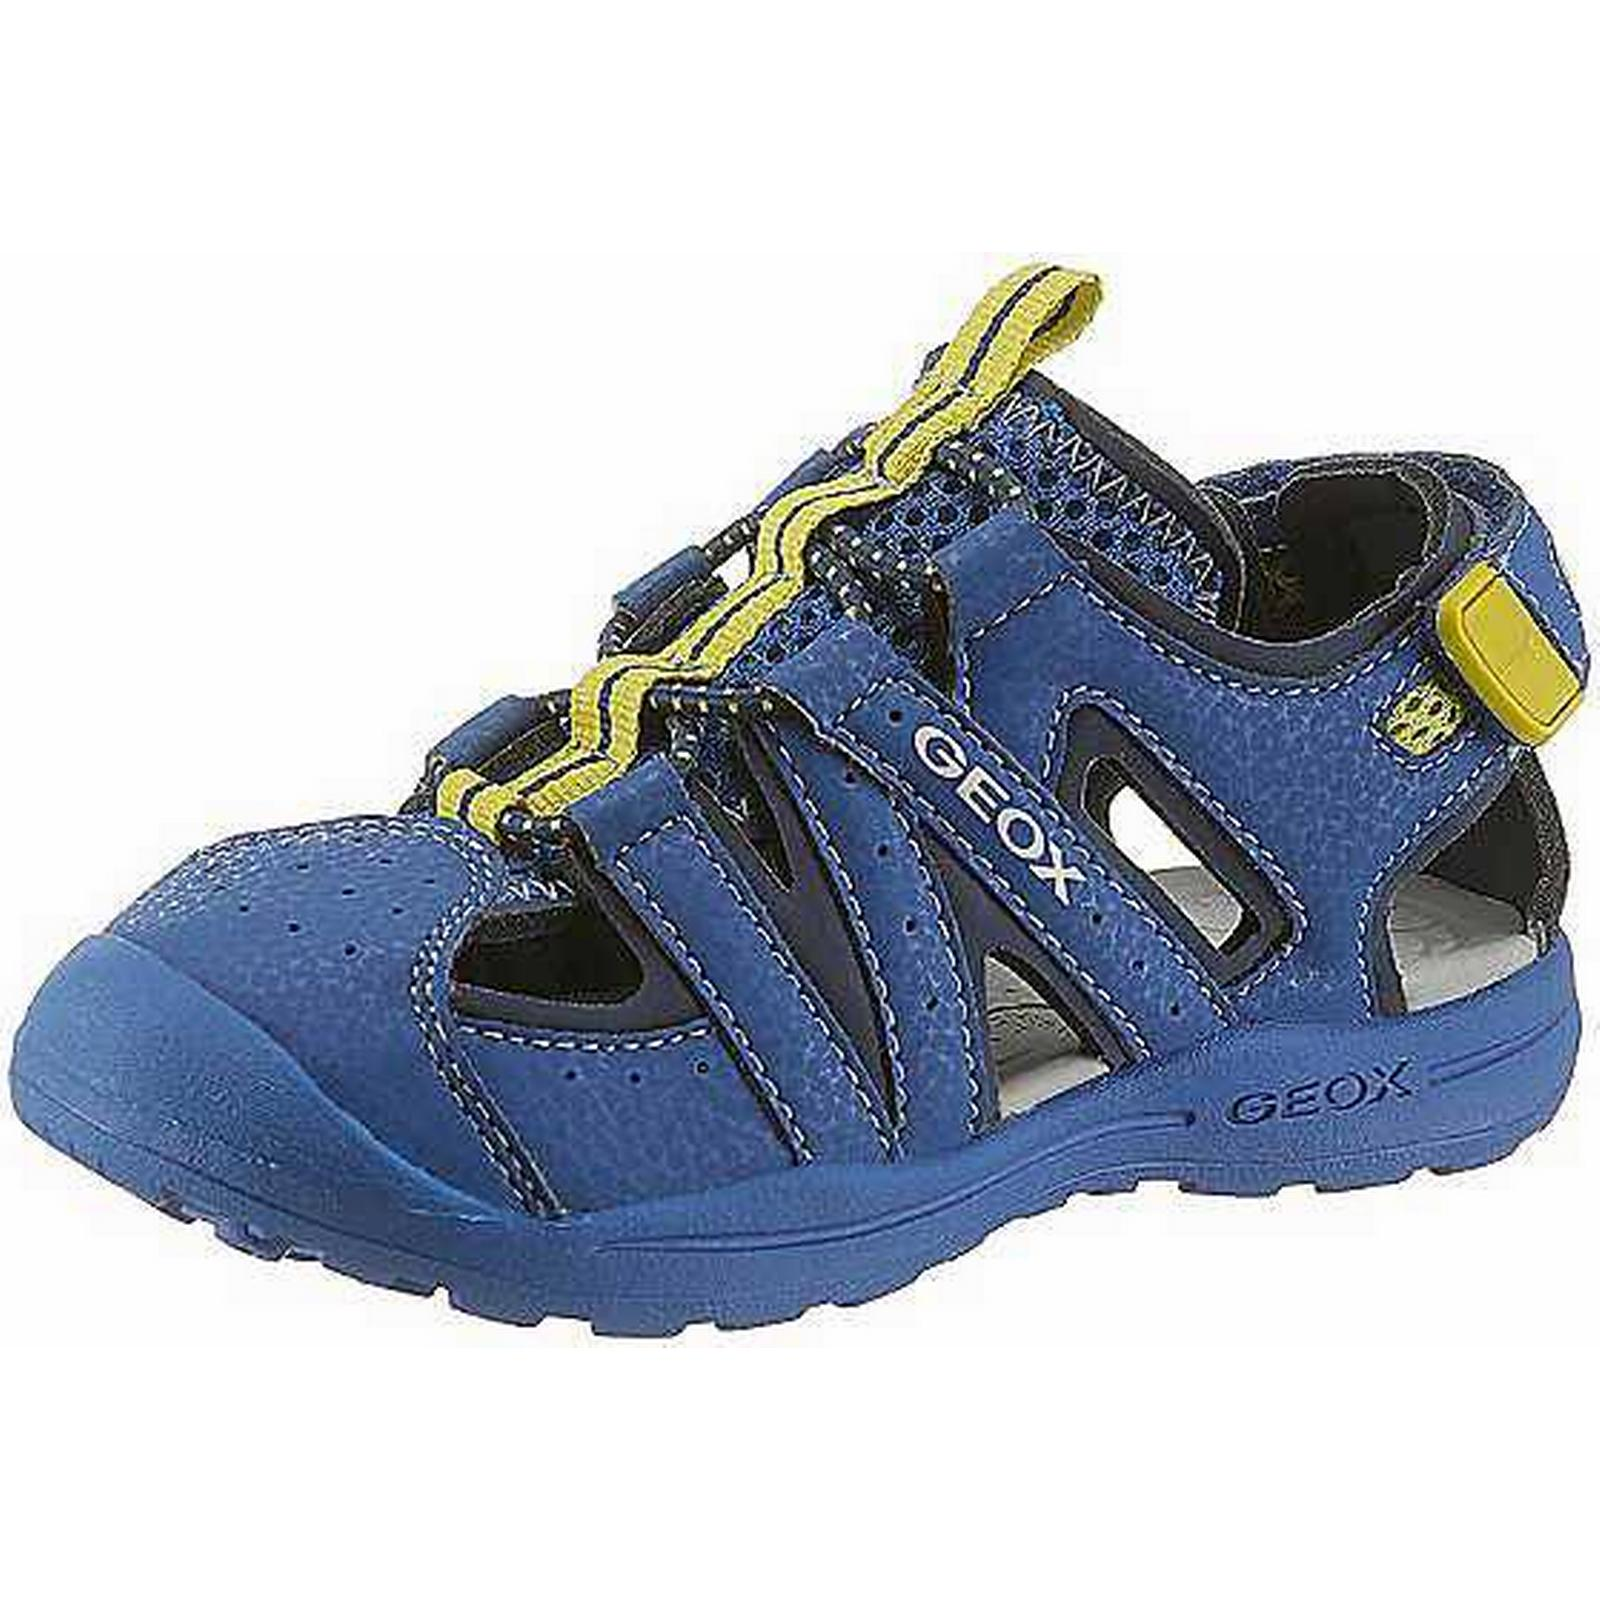 Geox Kids 'JR Vaniett' Boys specifications Sandals by Geox-Men's/Women's- Complete specifications Boys e9cbf2